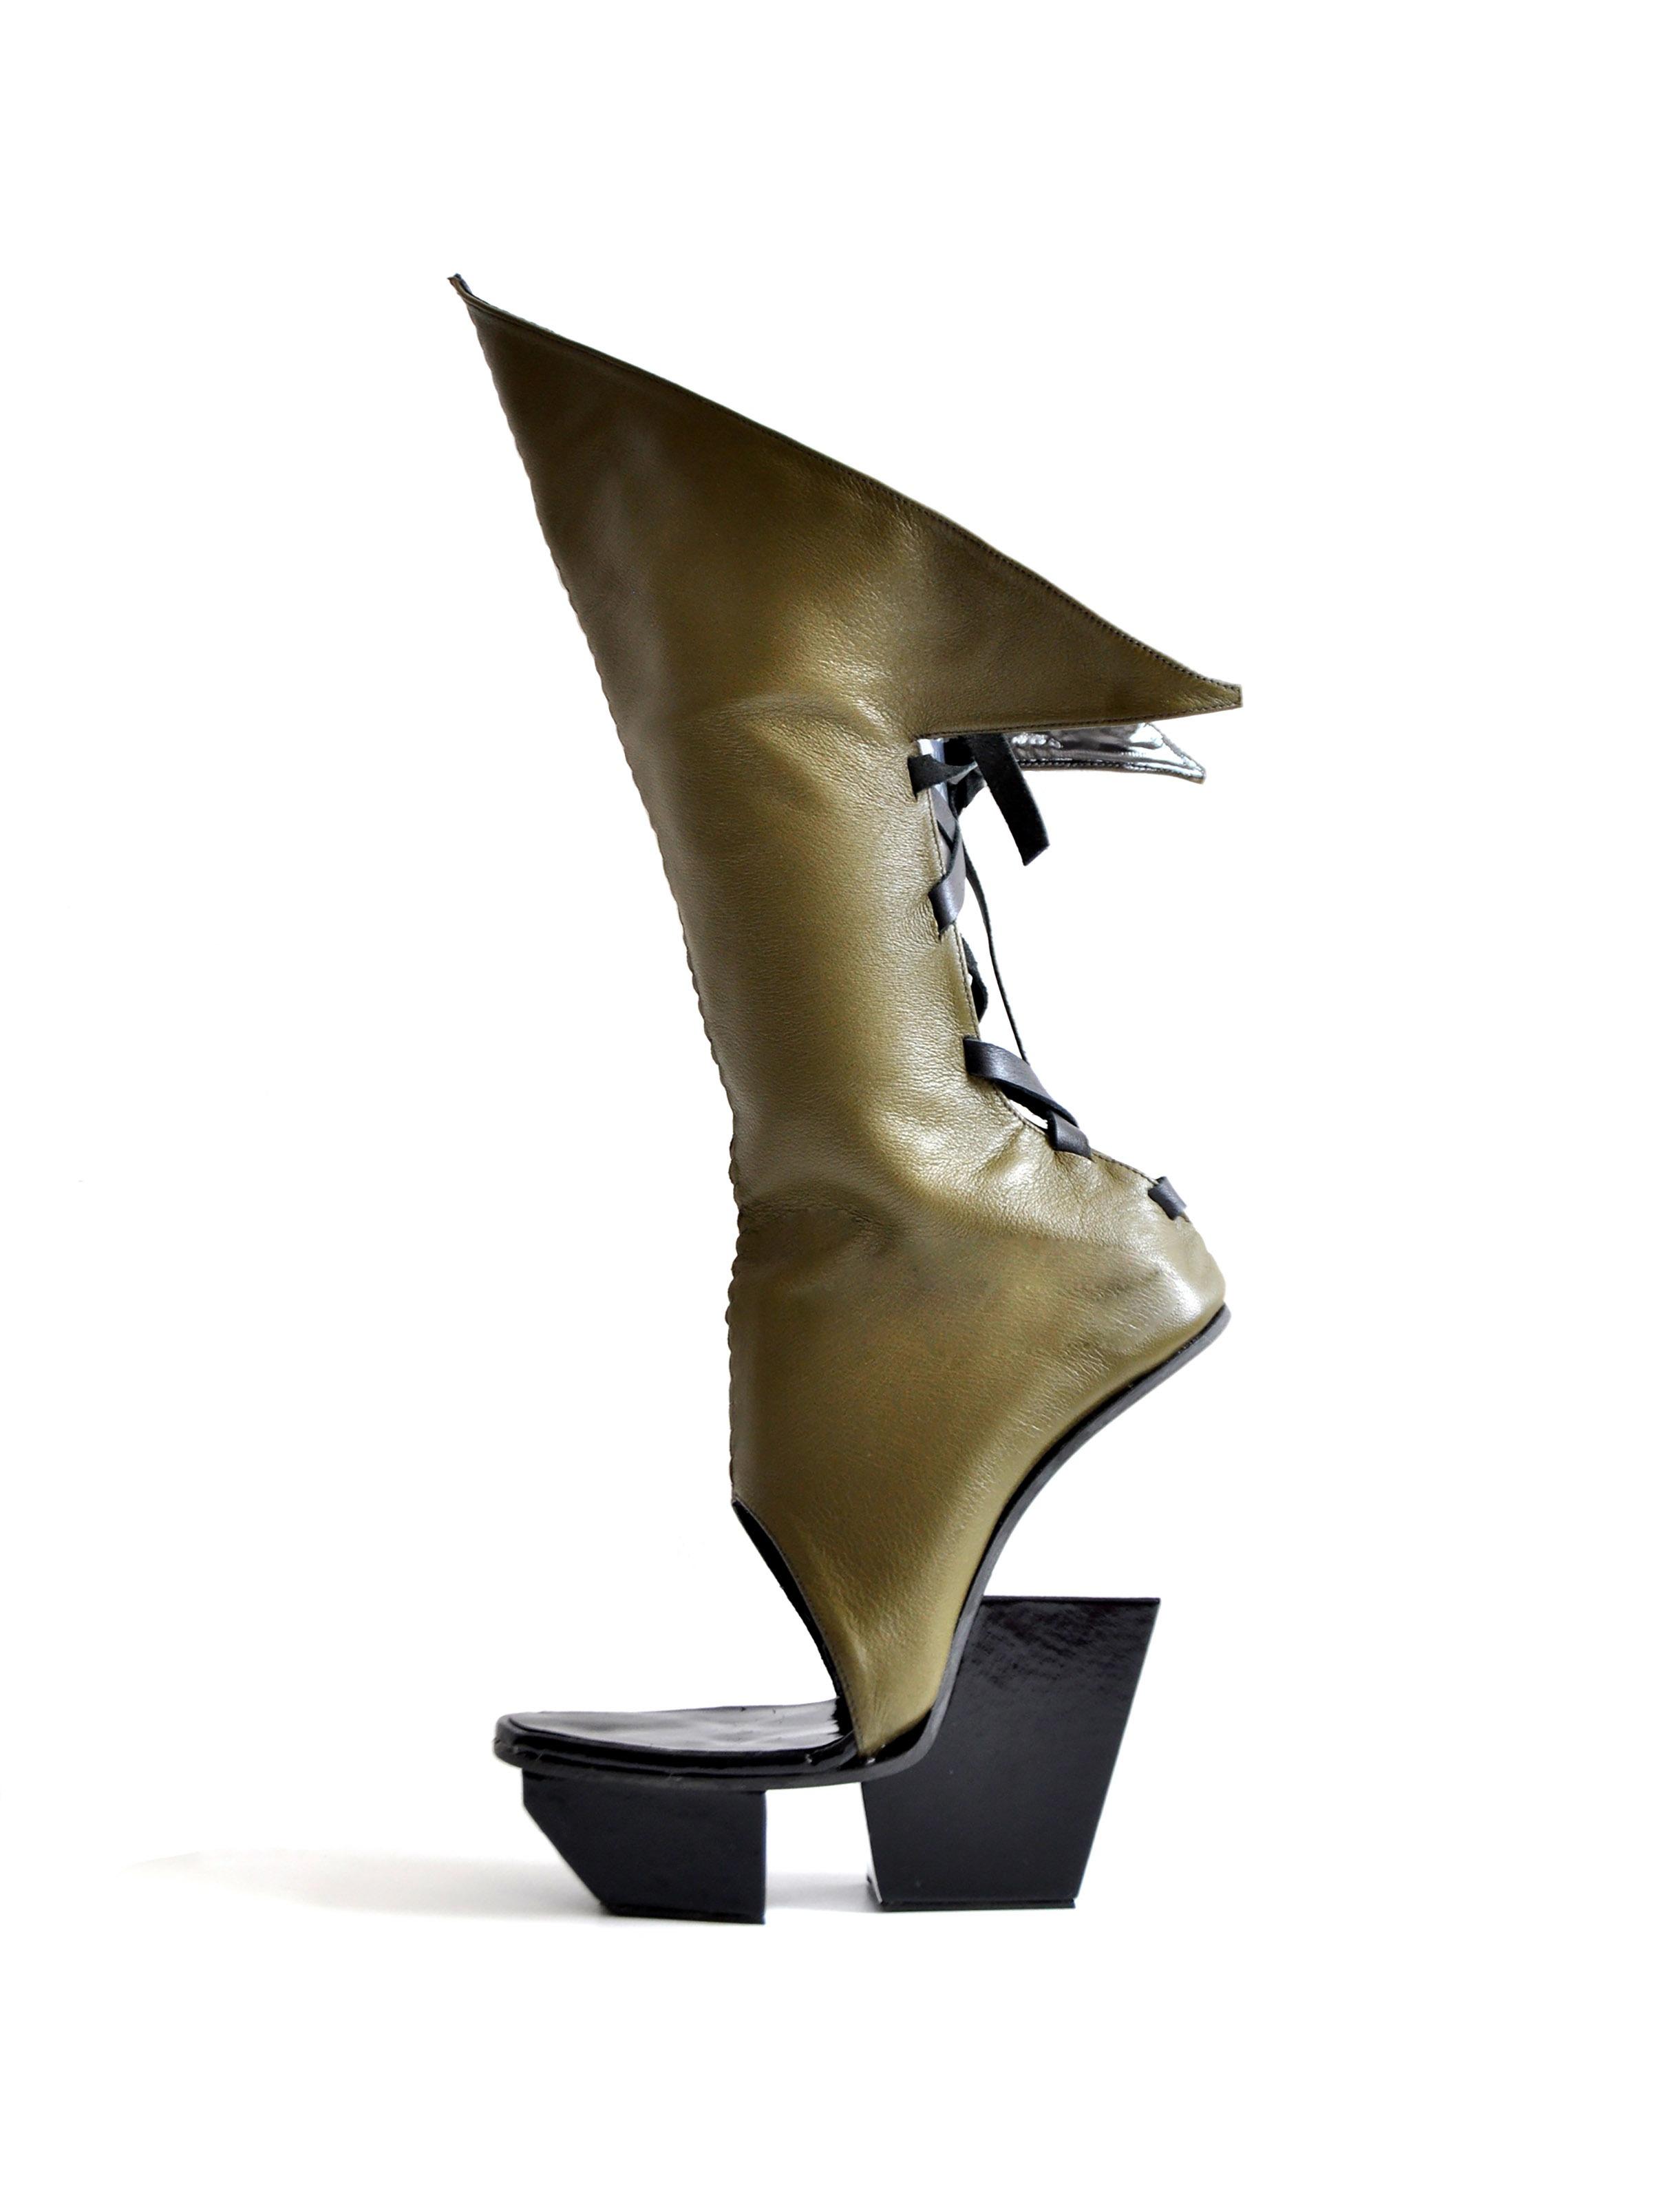 Carolin Holzhuber - (UN)COVER - StyleZeitgeist, Shoes, Patrick LaDuke, Footwear, Feature, Fashion, Carolin Holzhuber, 2017, (UN)COVER